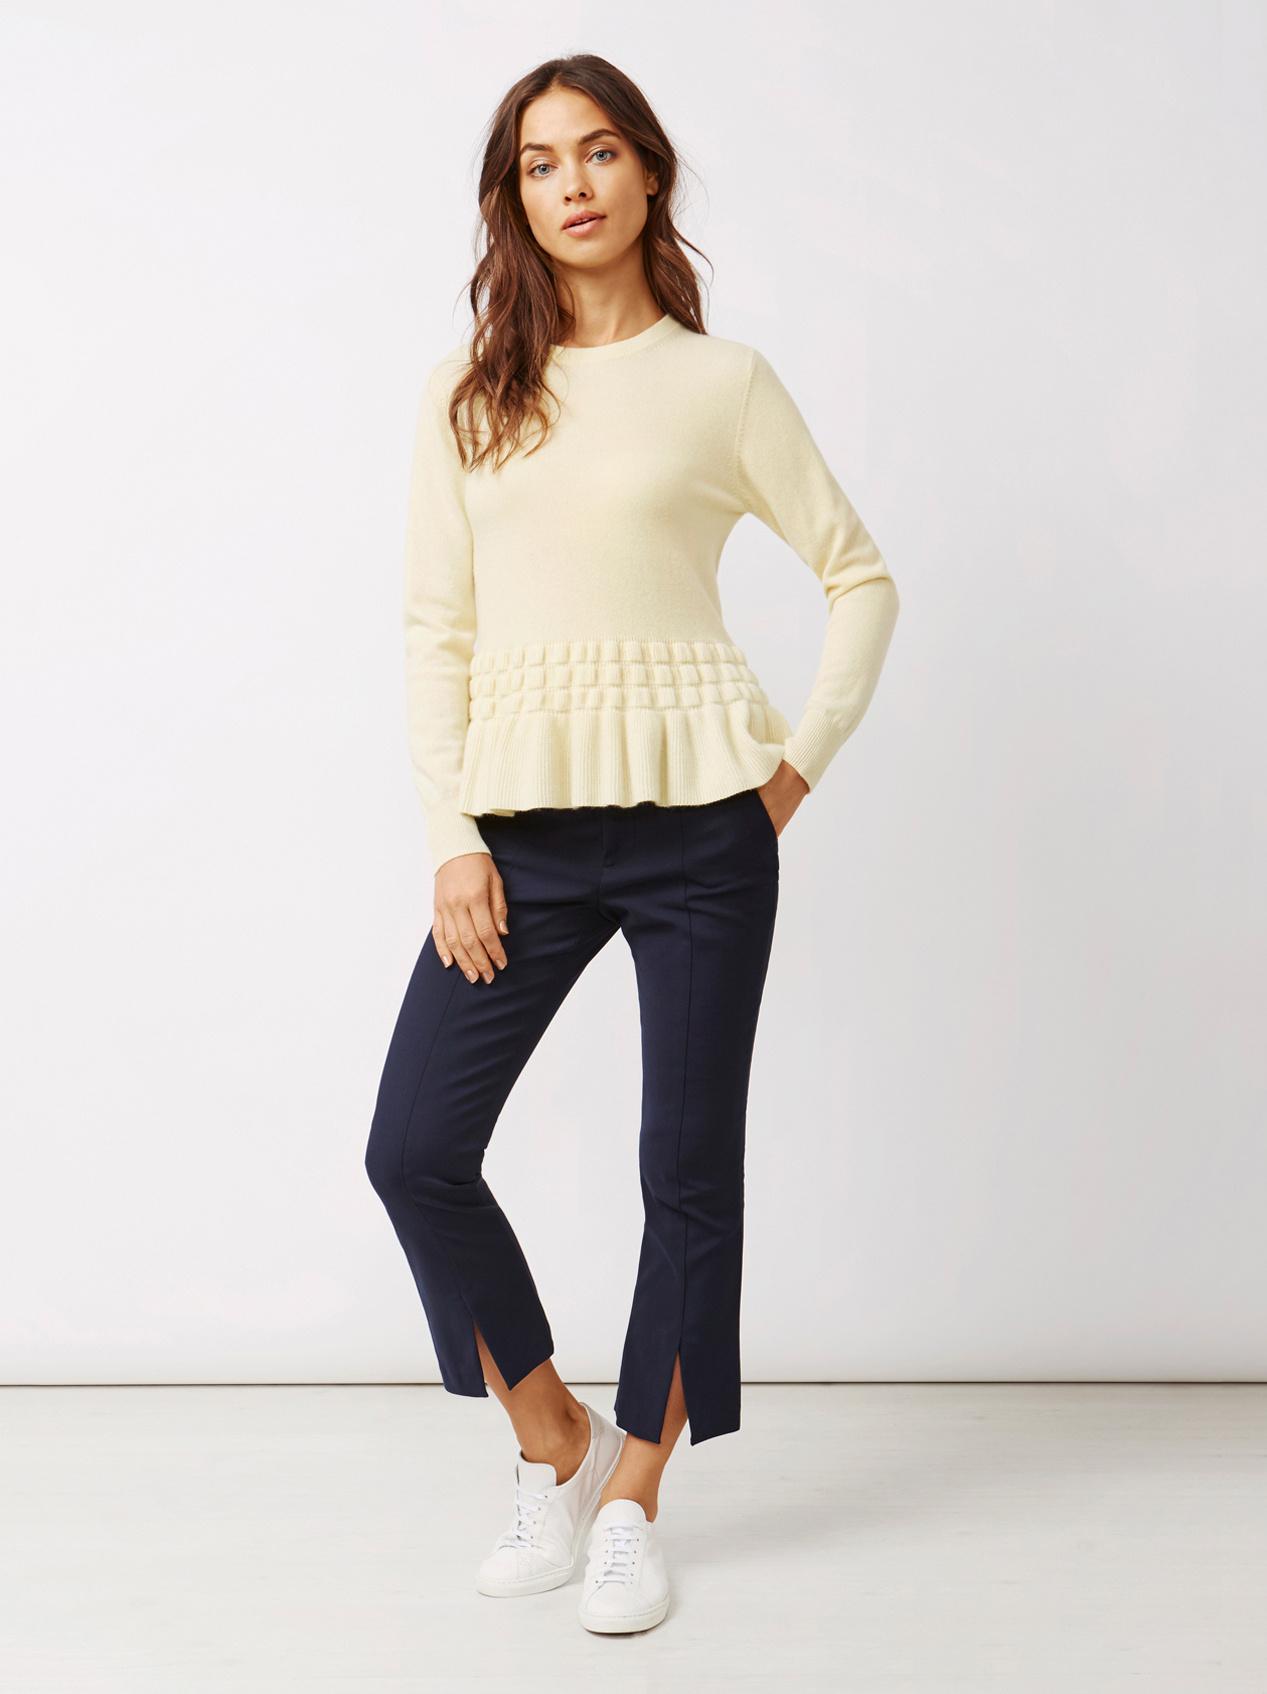 Soft Goat Women's Bottom Ruffle Sweater Limoncello